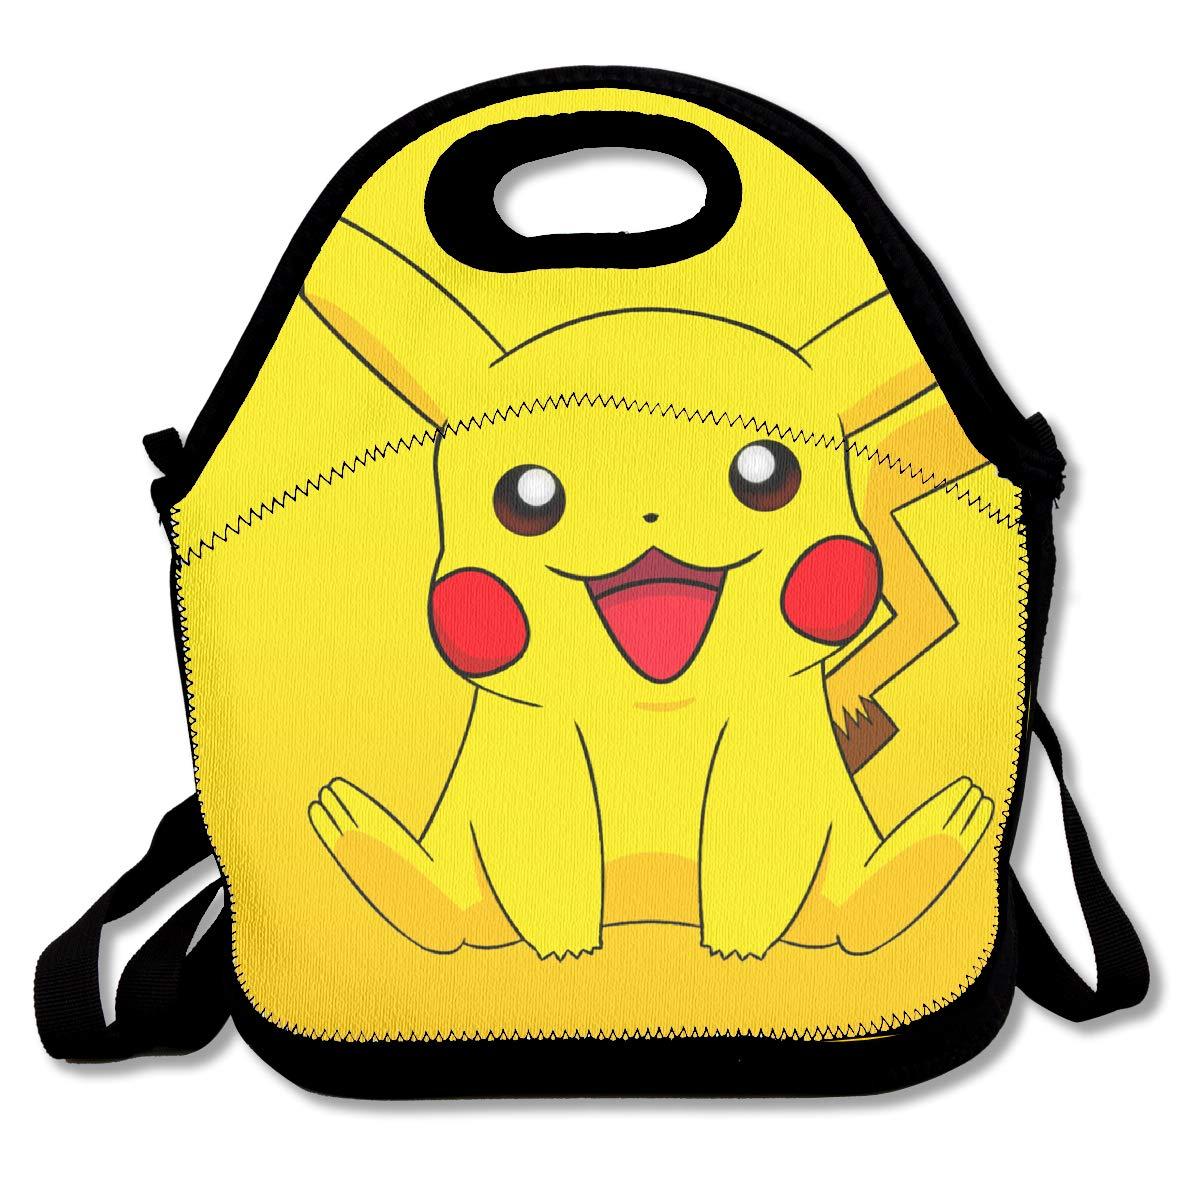 Pokemon Poke Ball Insulated Lunch Cooler Bag School Sports Gym Work Xams Gift